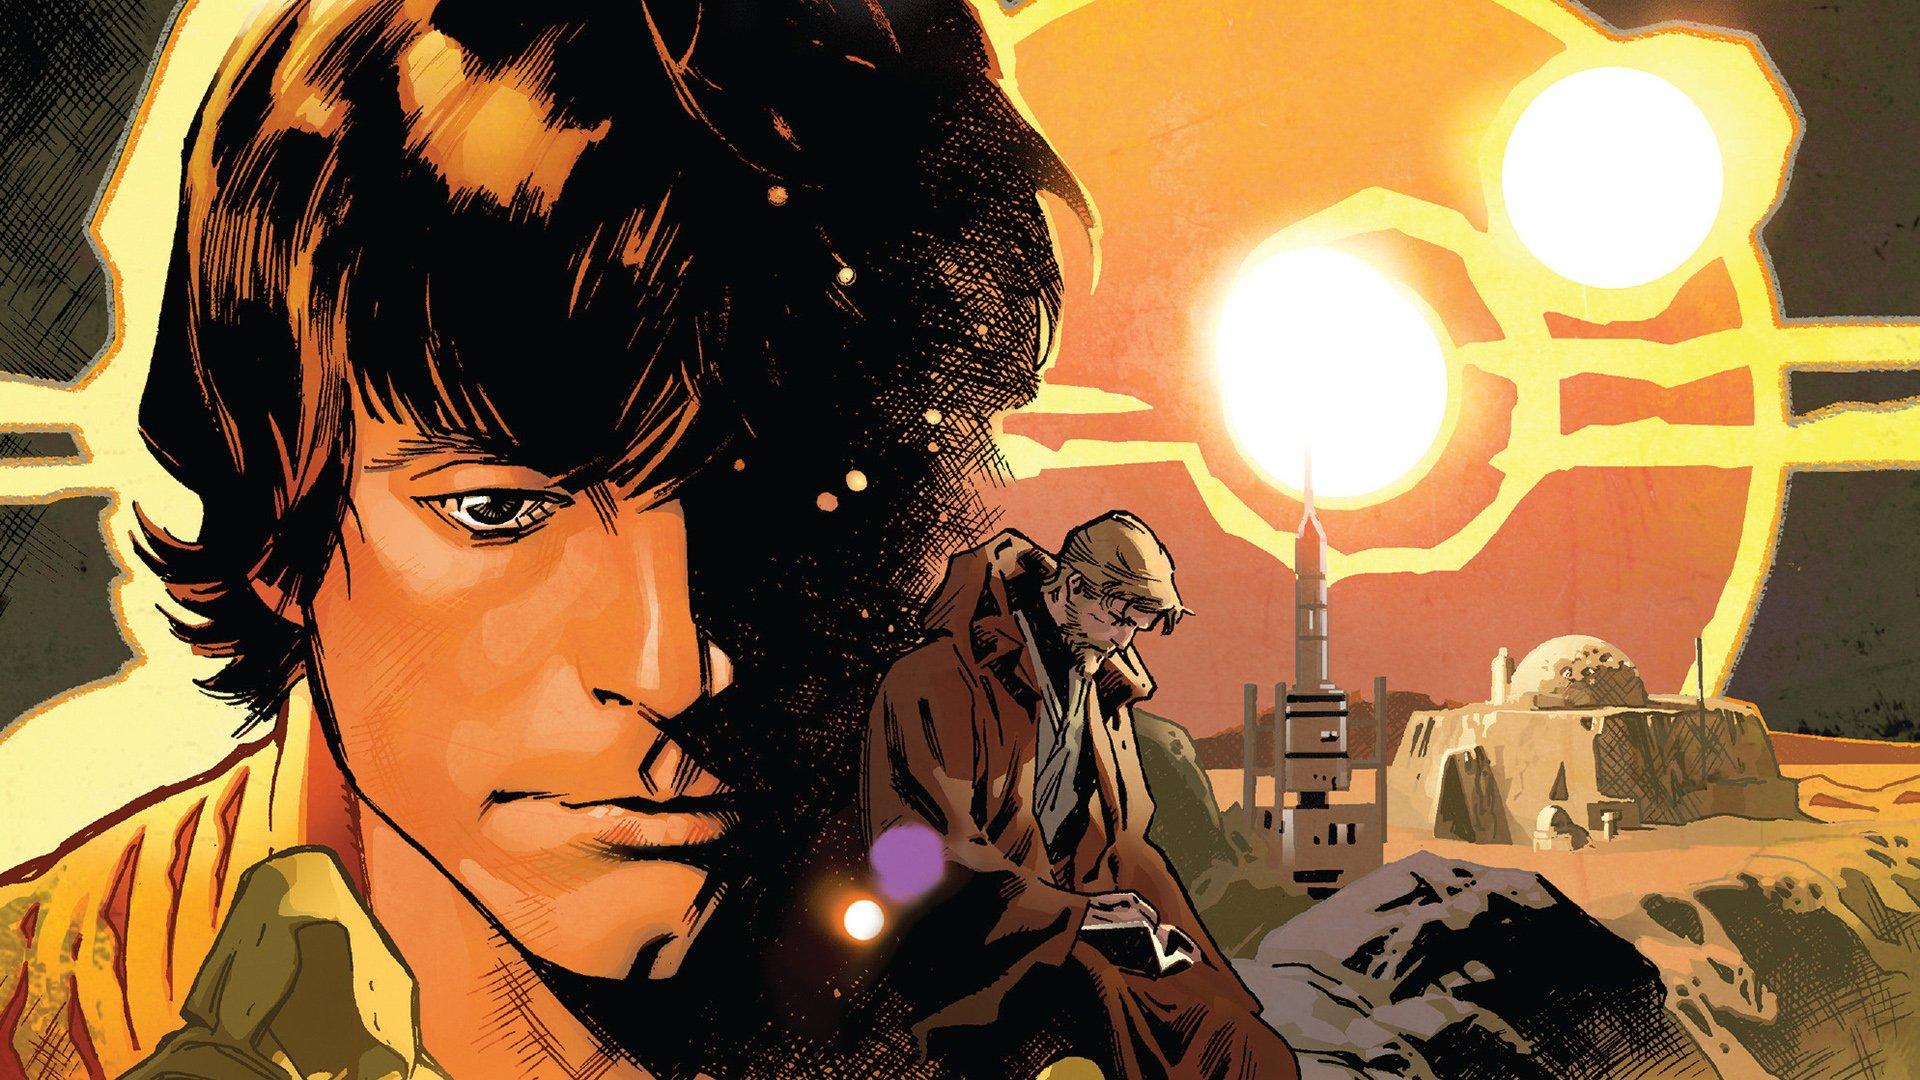 Star Wars 26 Yoda S Secret War Hd Wallpaper Background Image